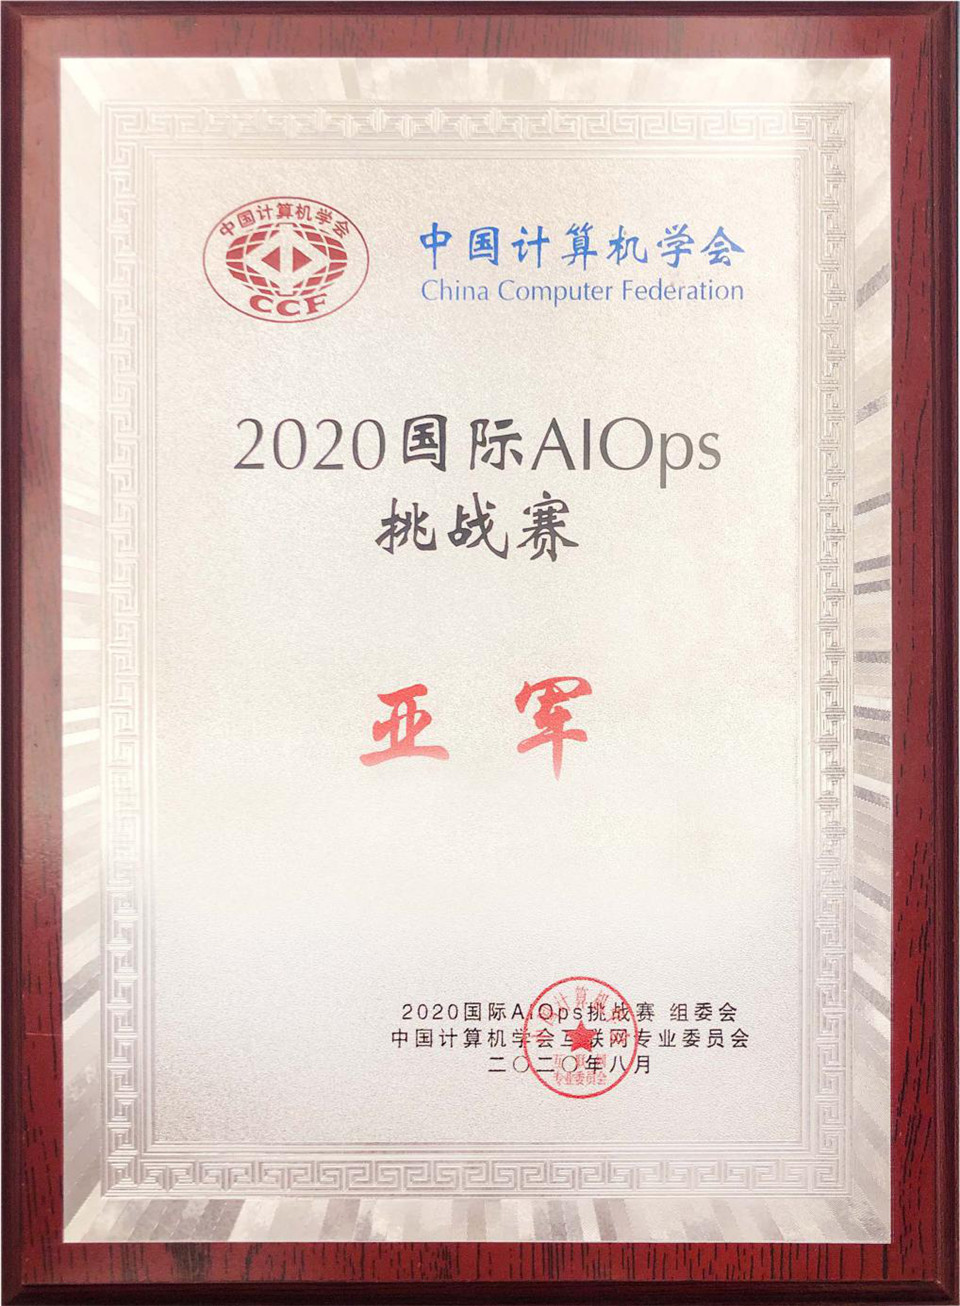 http://www.reviewcode.cn/rengongzhinen/166965.html